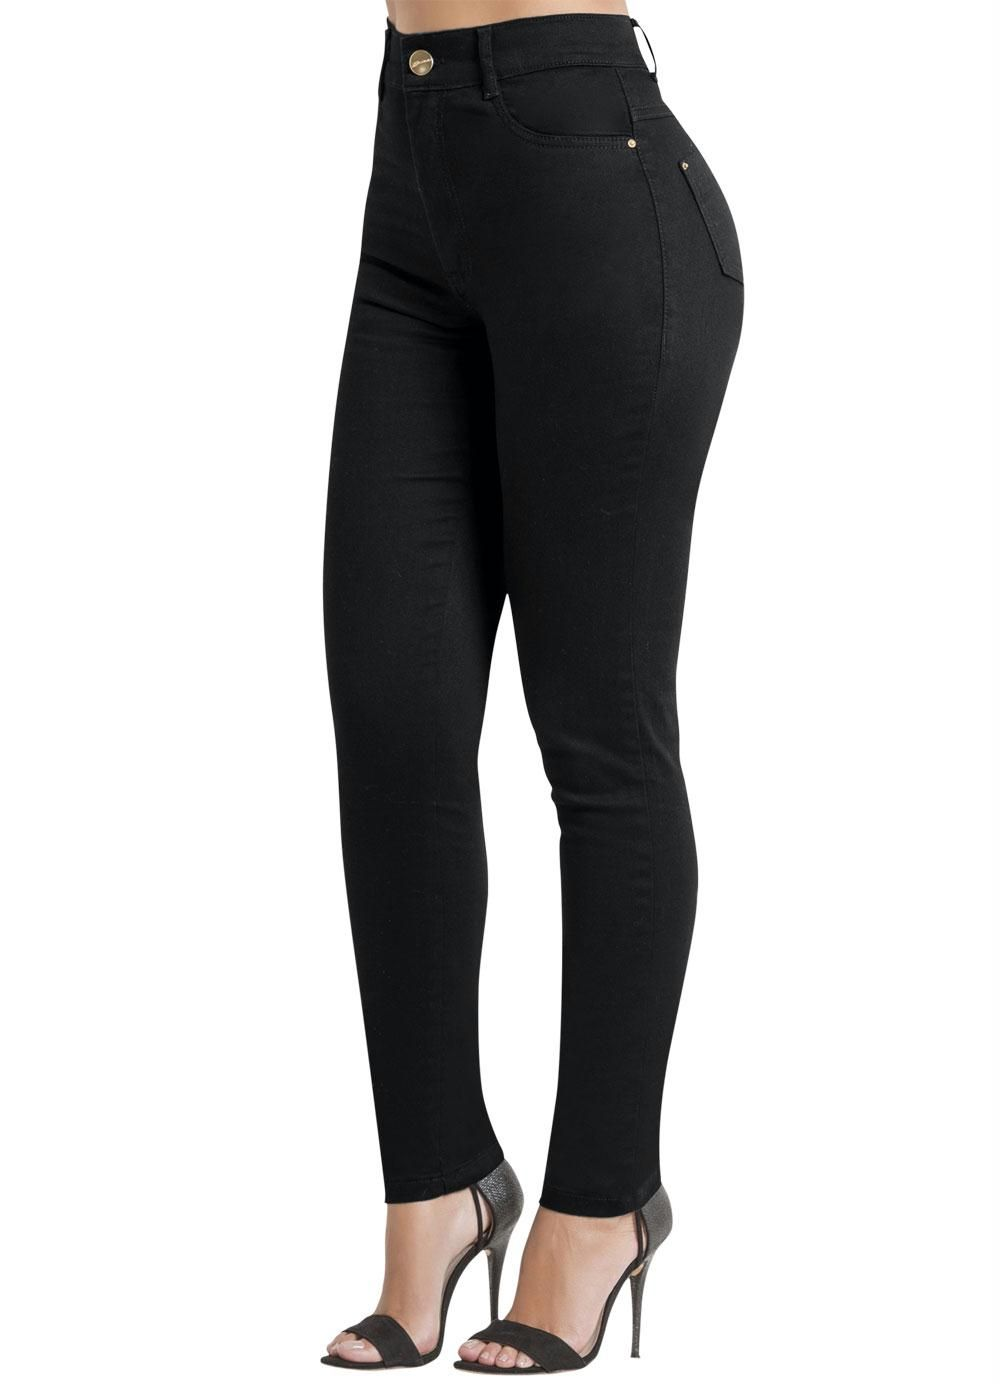 dae76a071 Calça Sarja Sawary Preta Modelo Hot Pants